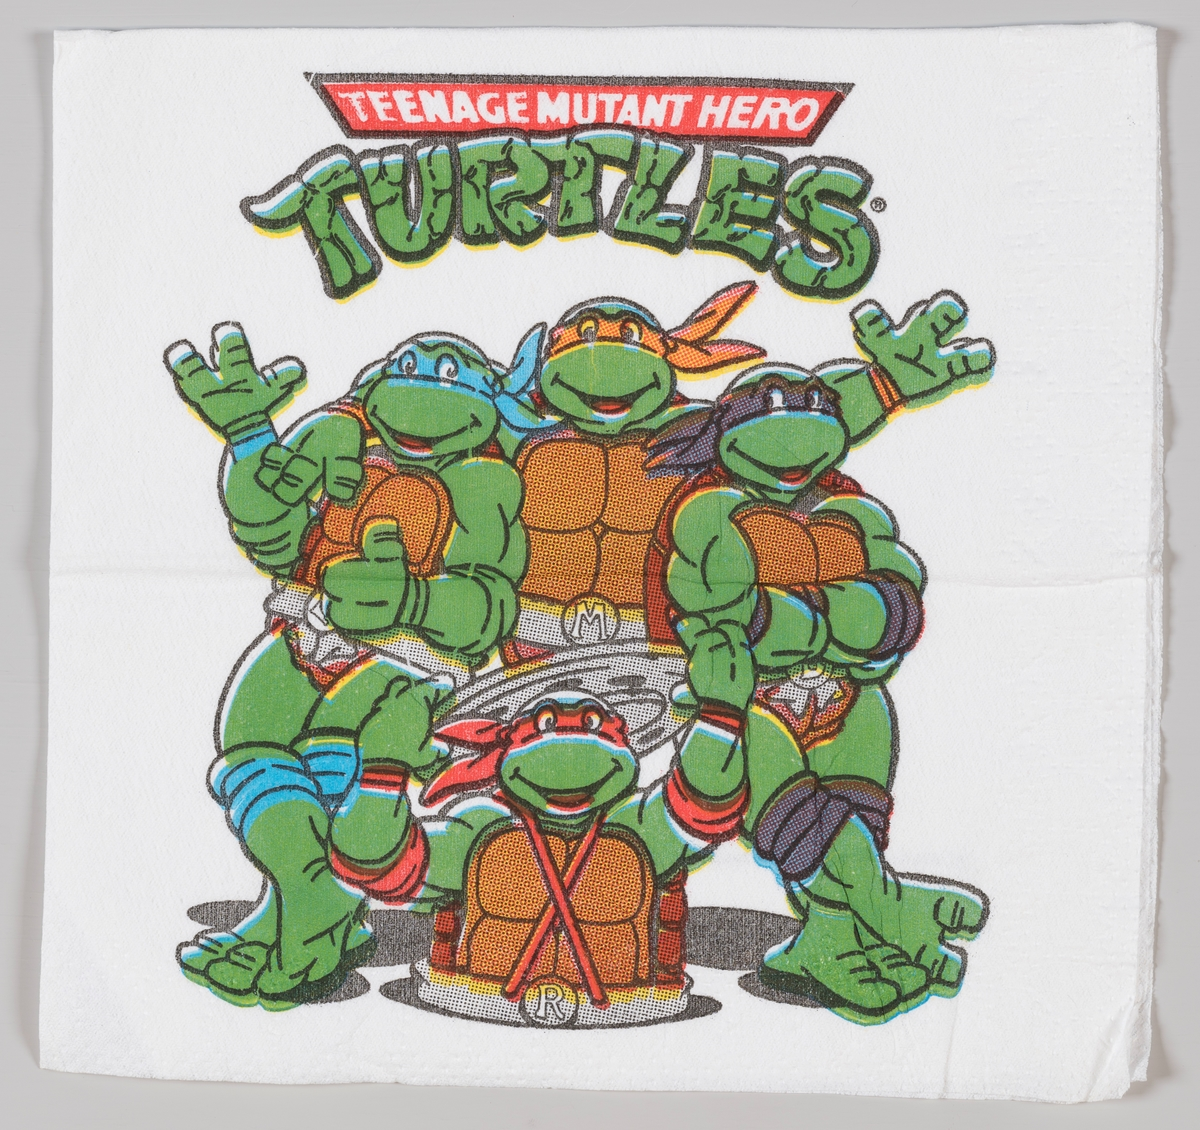 De fire Teenage Mutant Ninja Turtles.  Teenage Mutant Ninja Turtles er en amerikansk tegneserie som startet i 1984. Serien handler om de fire skilpaddene Leonardo, Donatello, Raphael, Michelango.